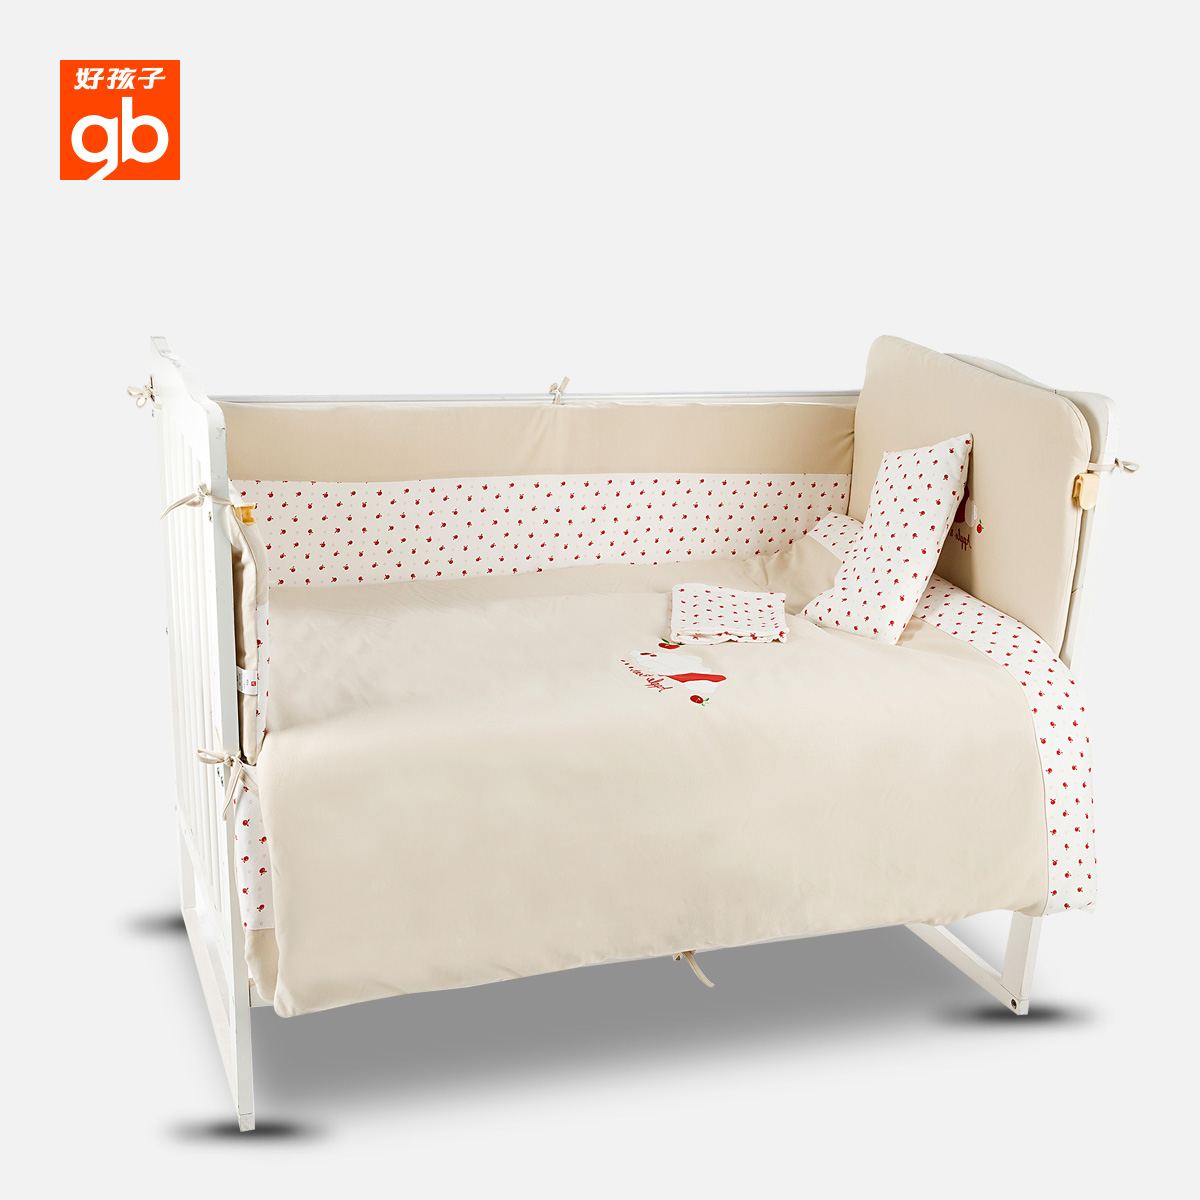 好孩子familybygb婴儿床品MQ16715315